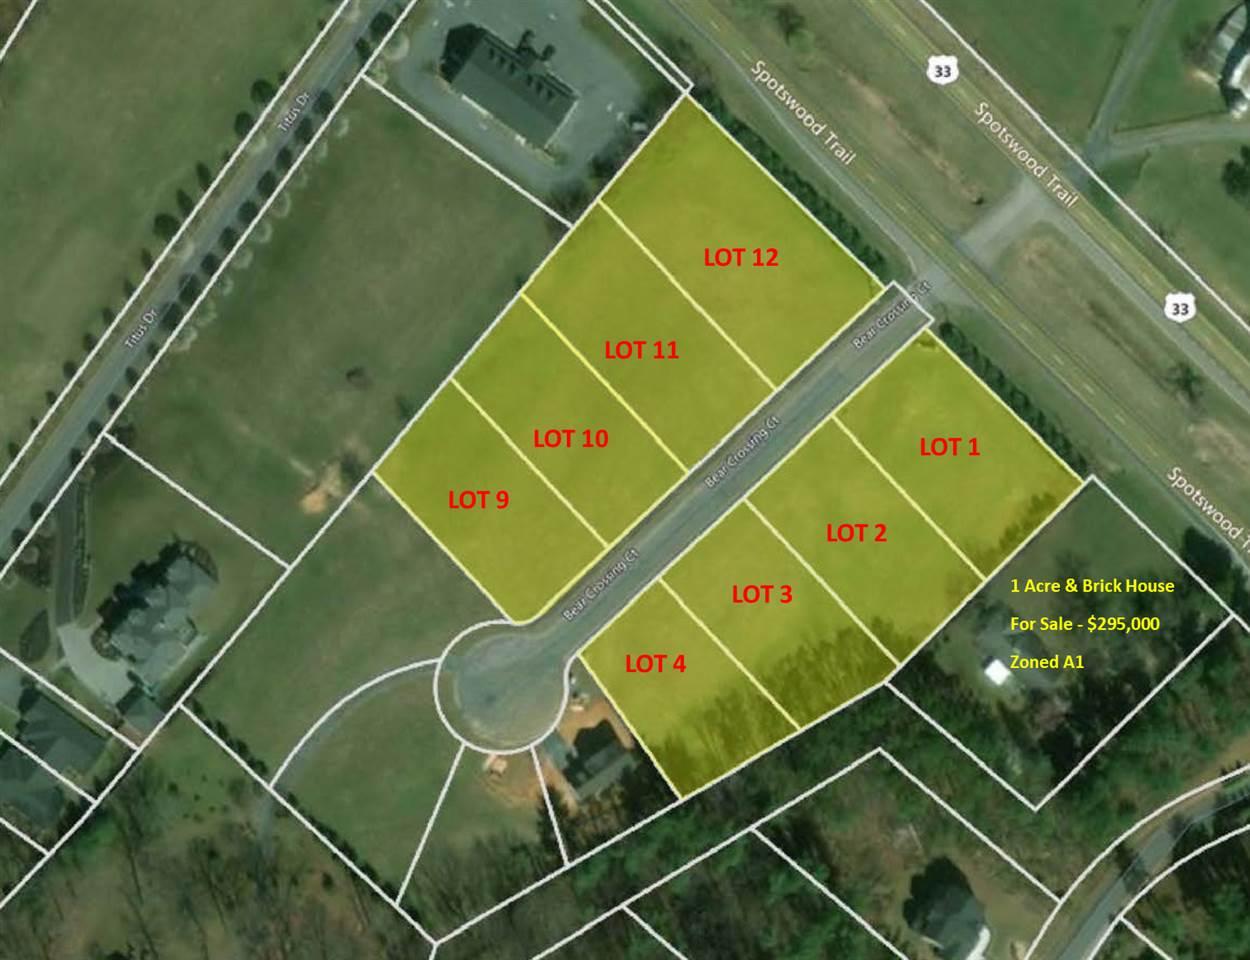 Lot 12 BEAR CROSSING CT, PENN LAIRD, VA 22846